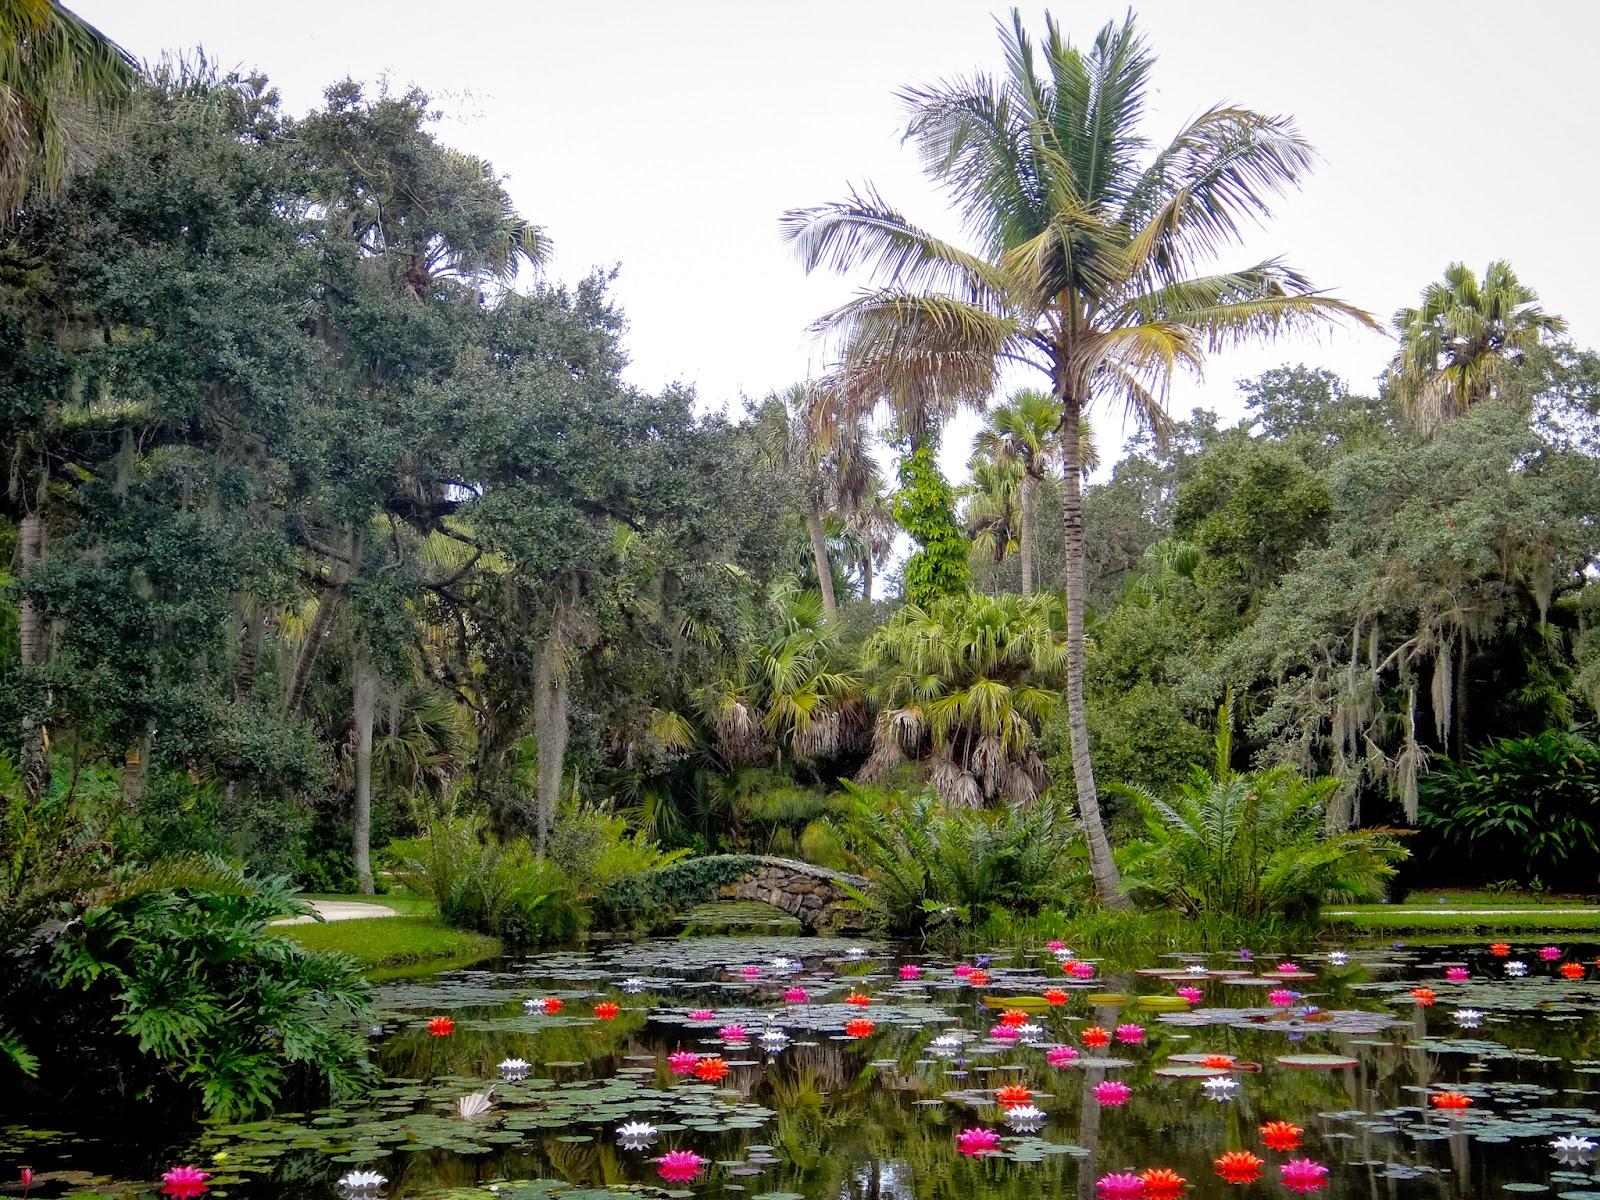 Charmant Mckee Botanical Garden